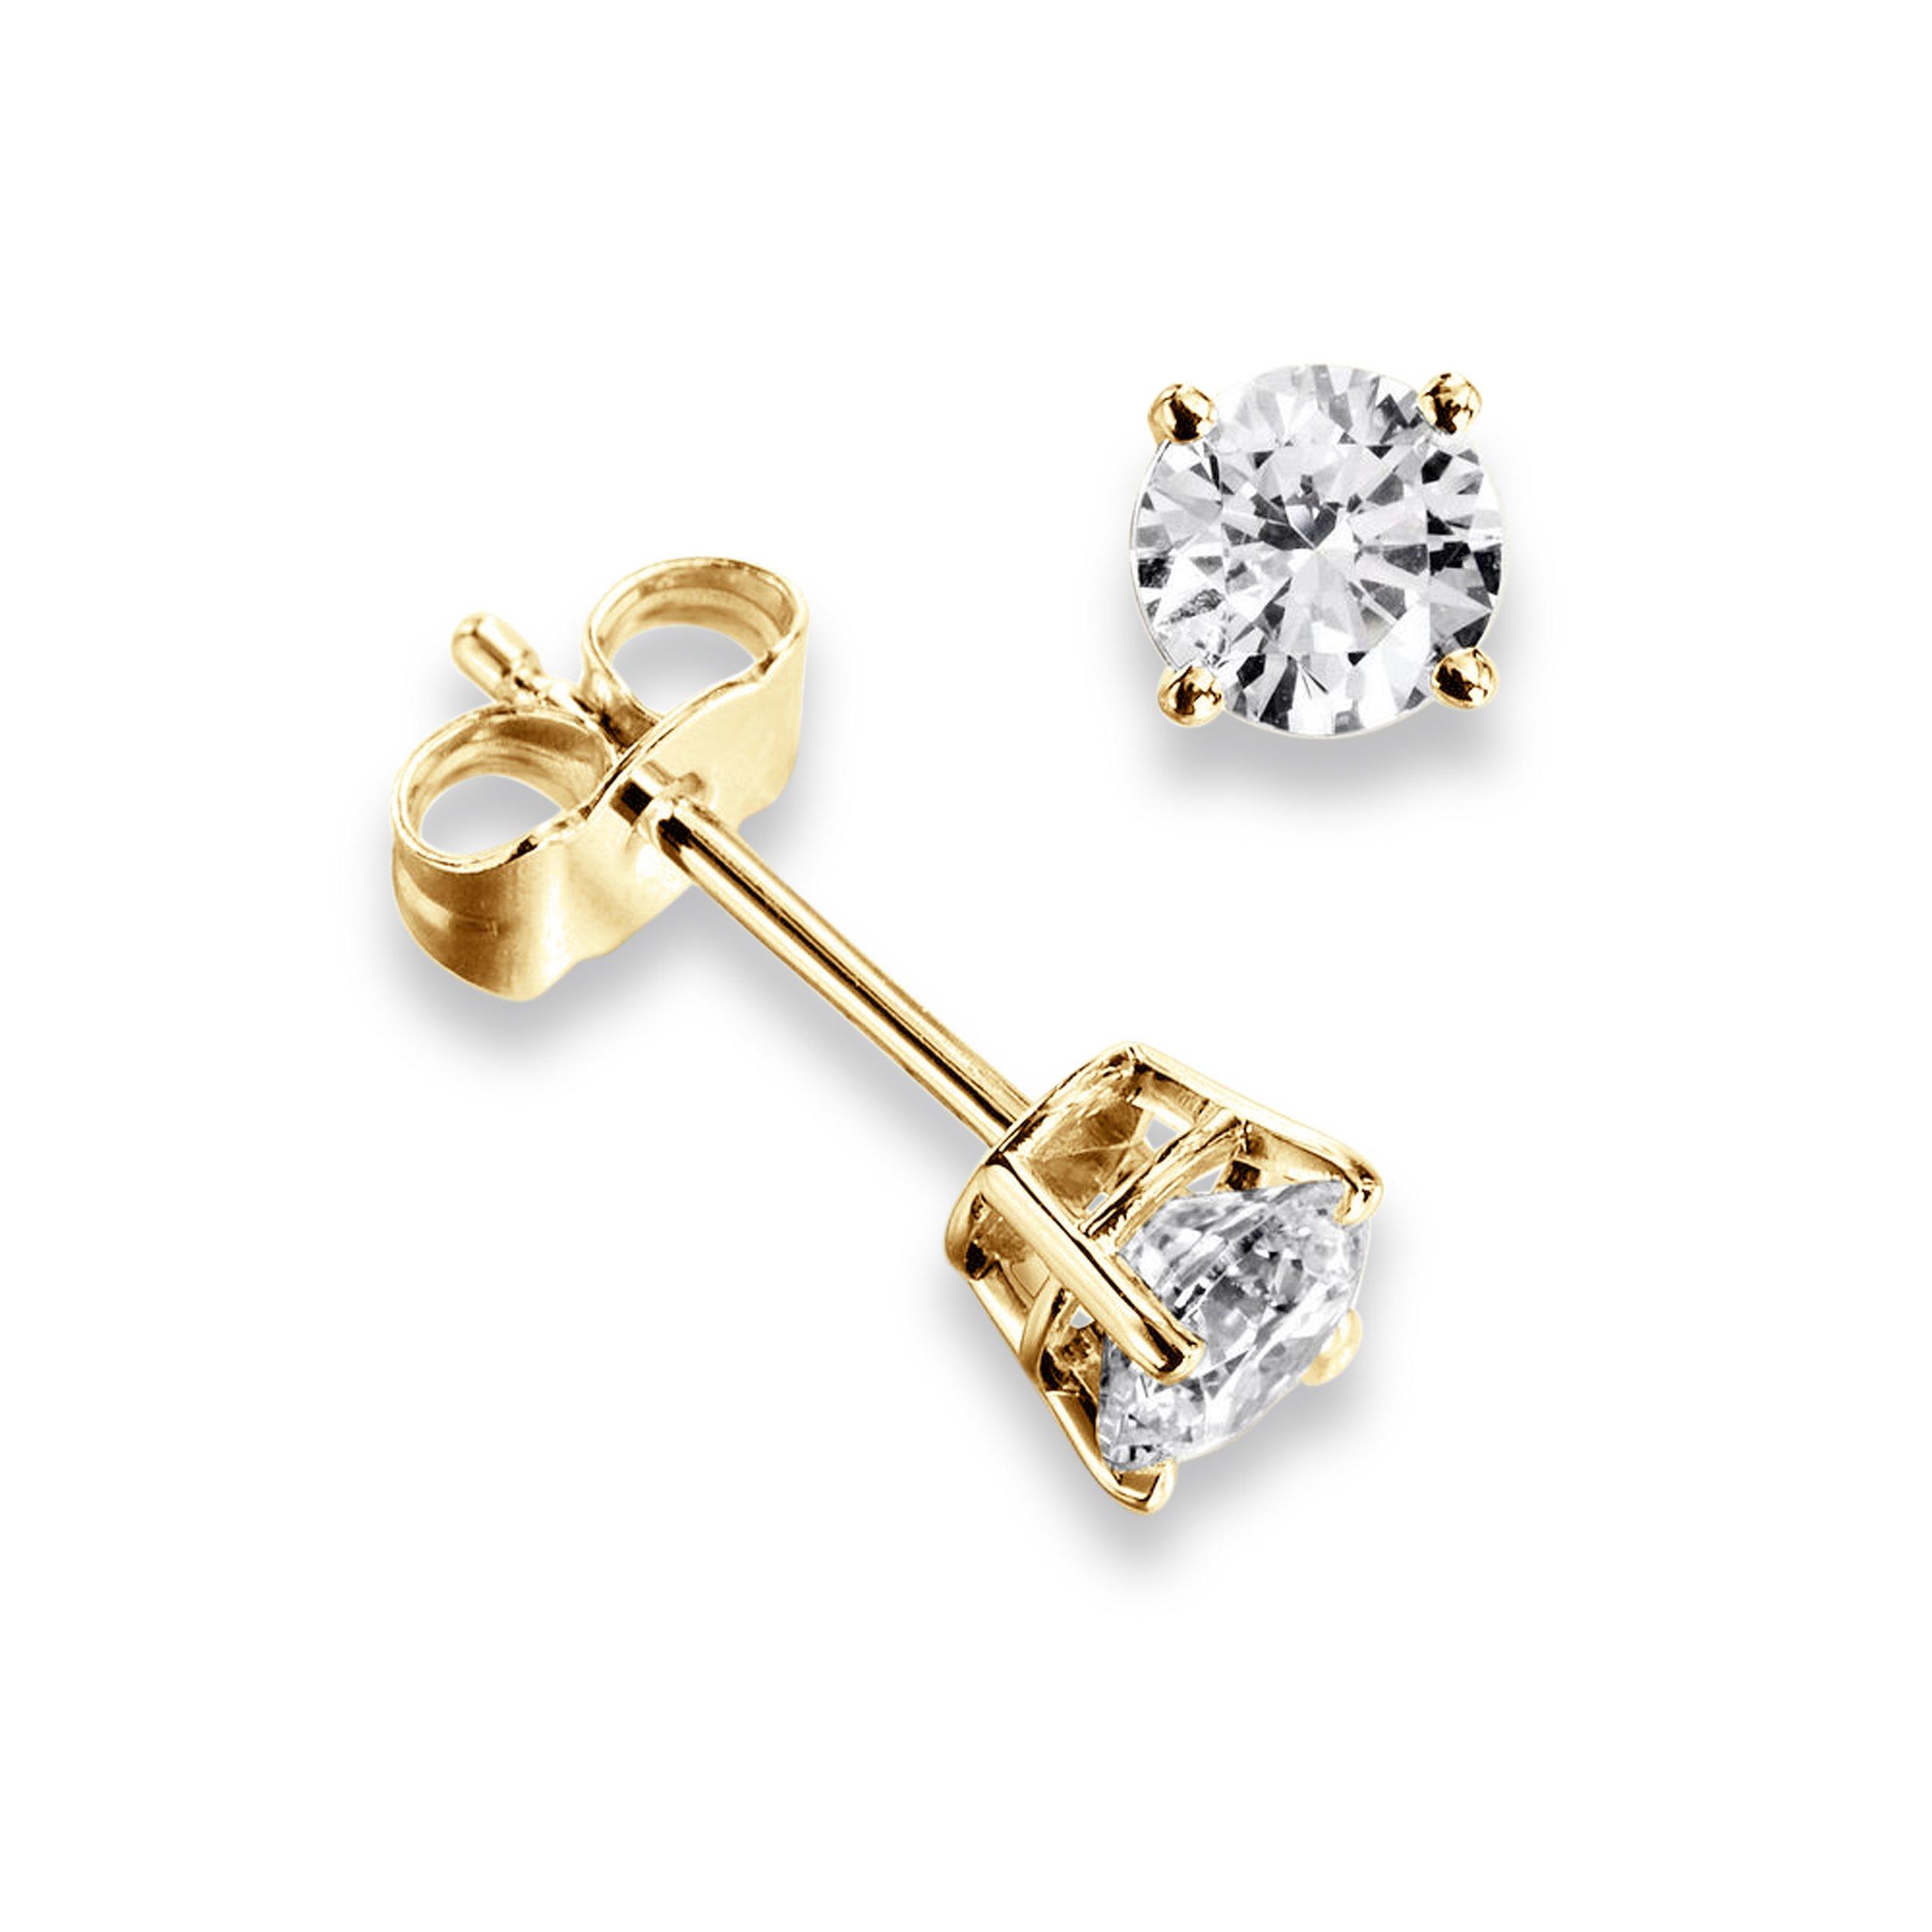 c02f4ddc5 Platinum & Yellow/White Gold Single Diamond Stud Earrings For Men